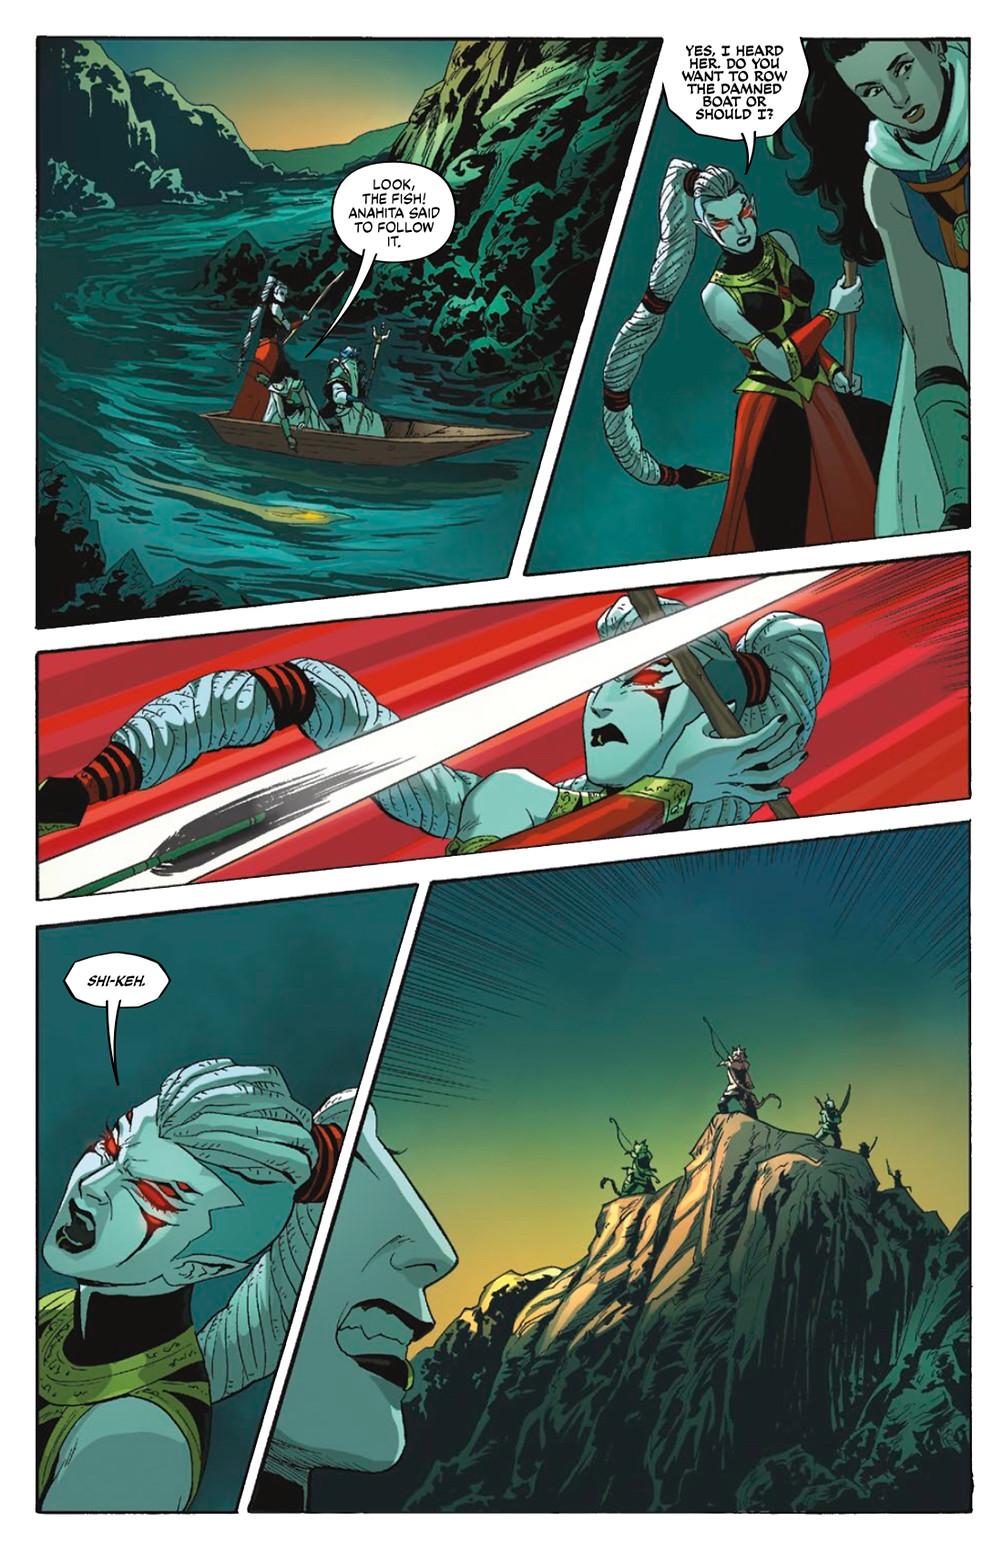 Sera and the Royal Stars, issue #3, Vault Comics, Tsuei/Mok